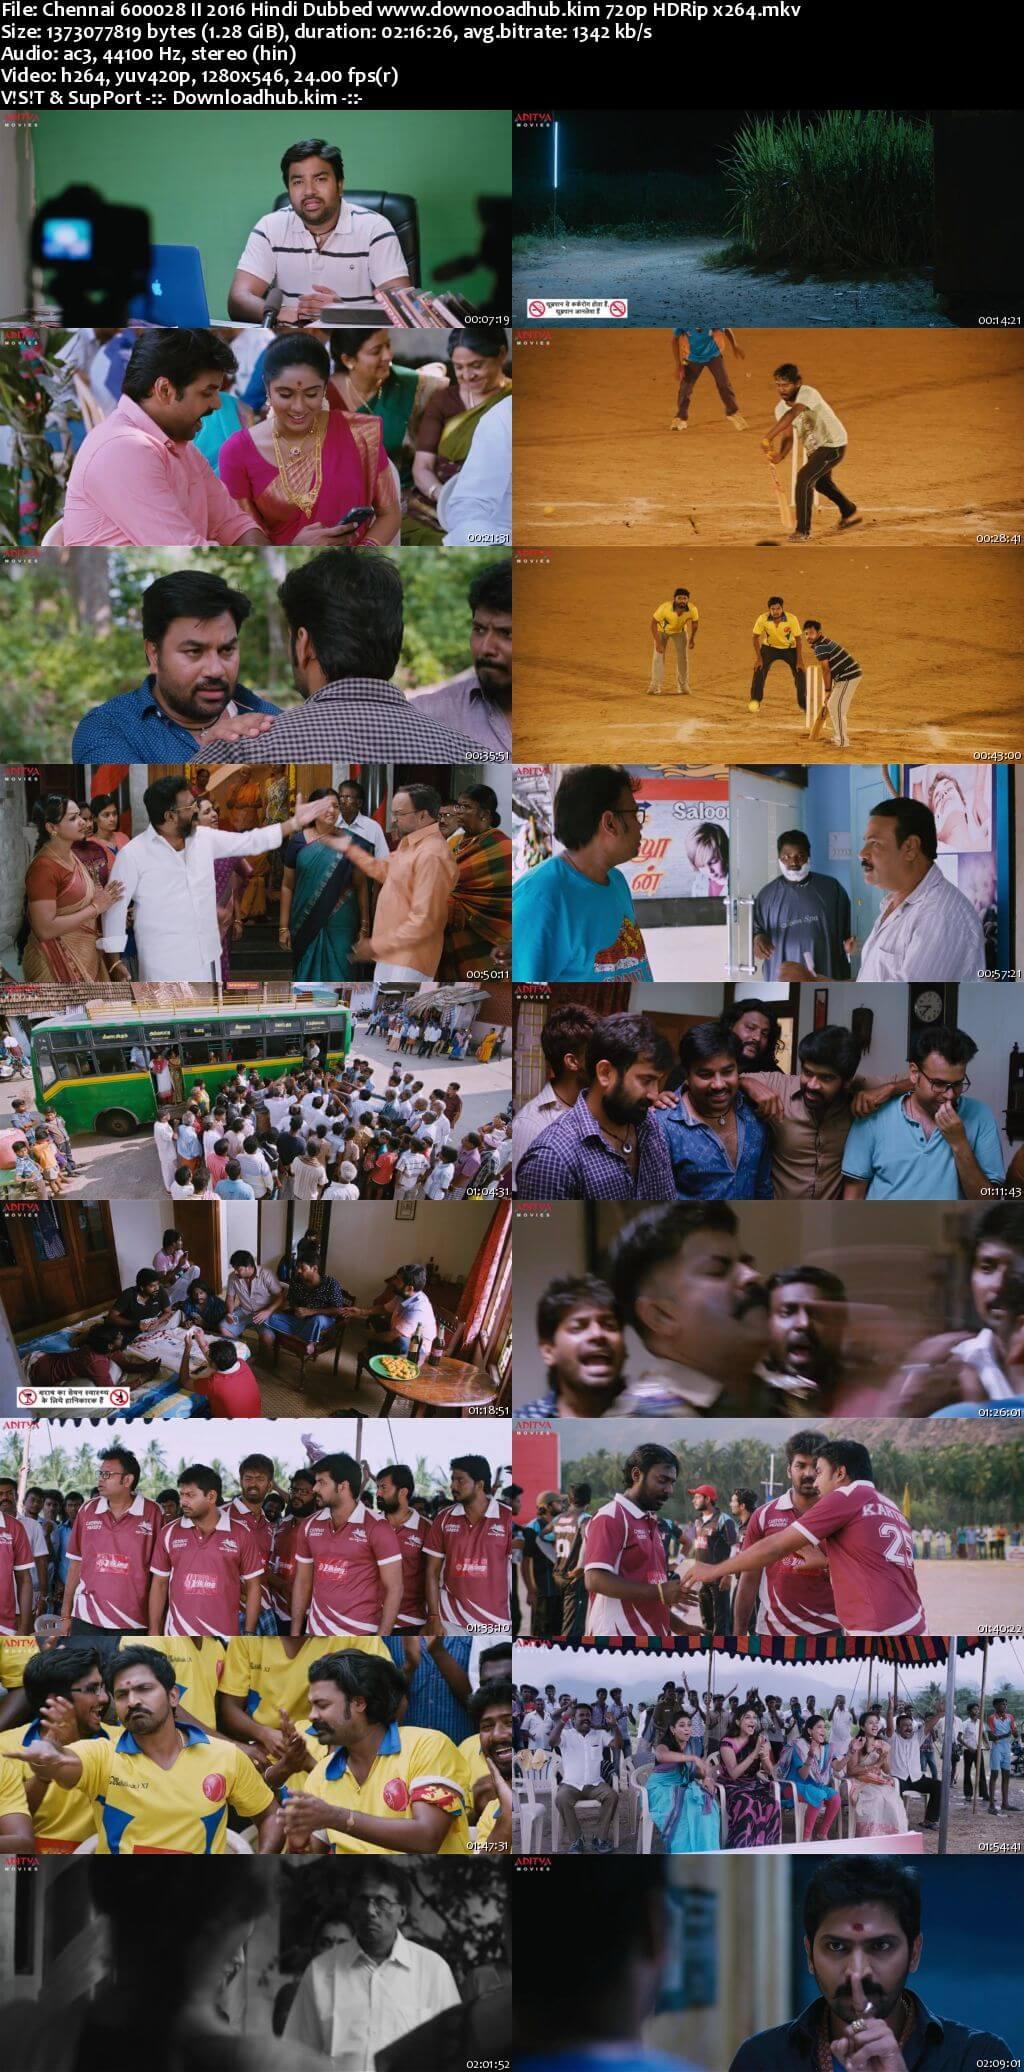 Chennai 600028 II 2016 Hindi Dubbed 720p HDRip x264